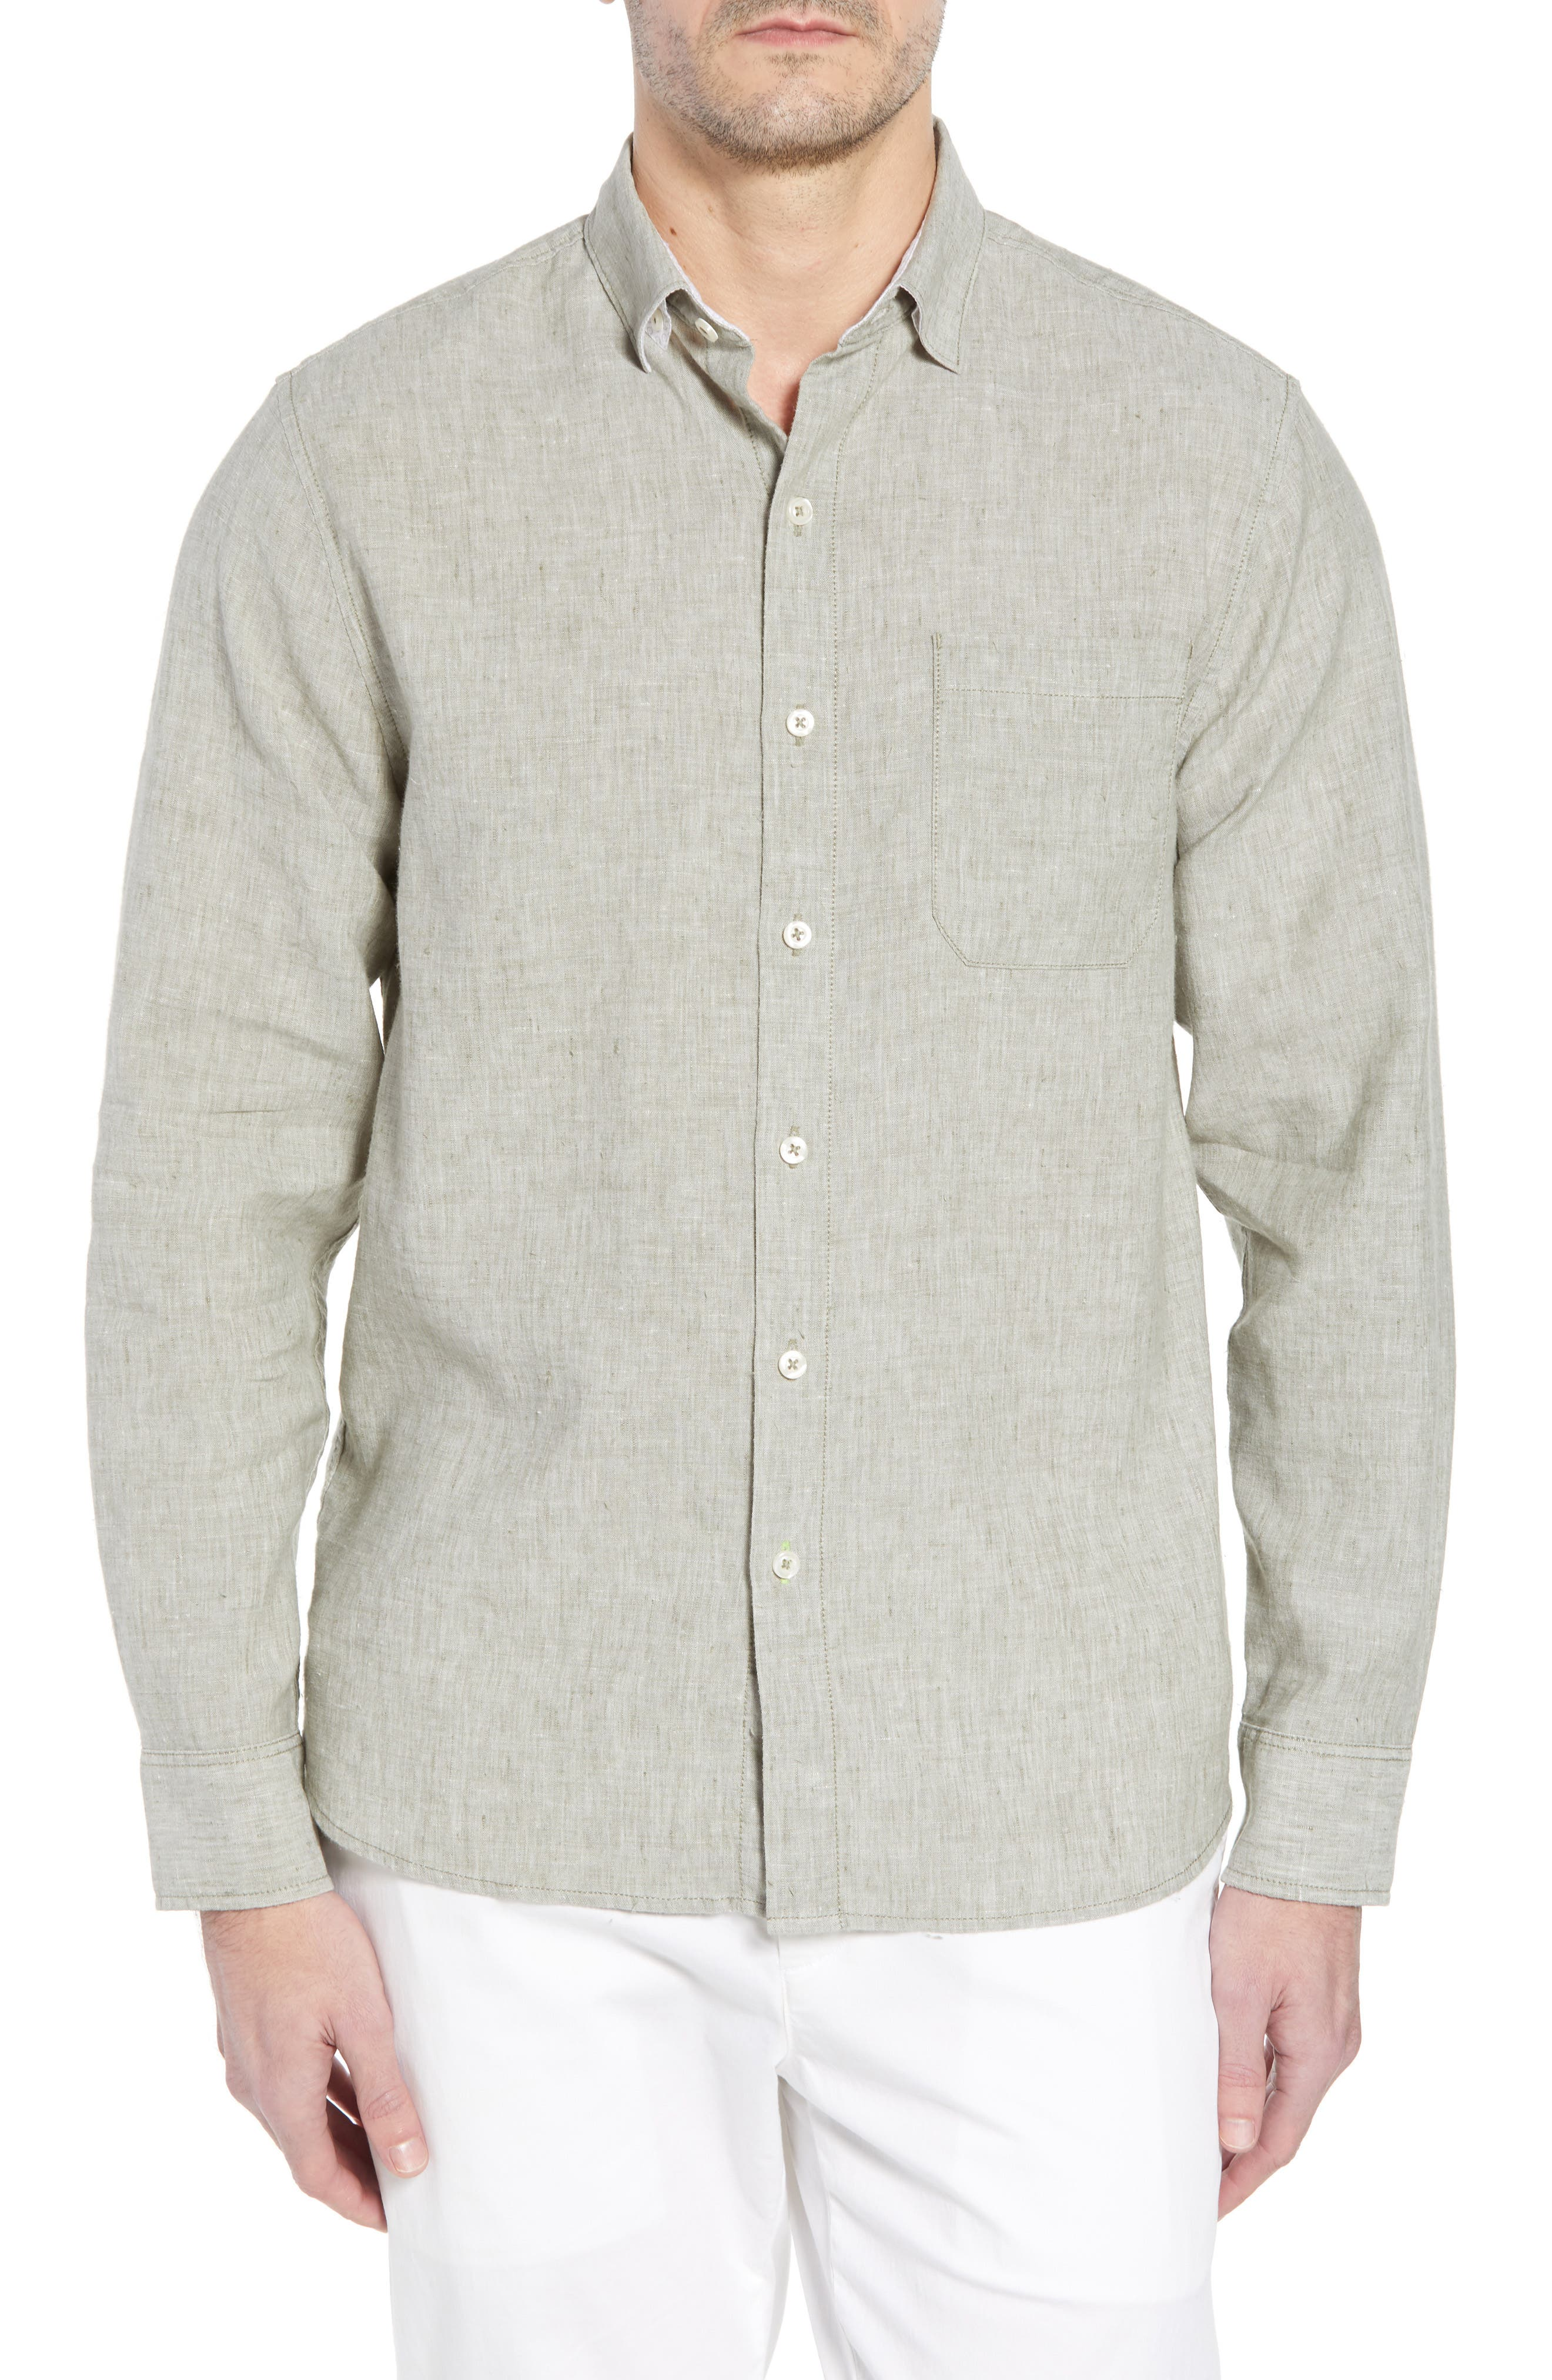 Alternate Image 1 Selected - Tommy Bahama Lanai Tides Regular Fit Linen Blend Sport Shirt